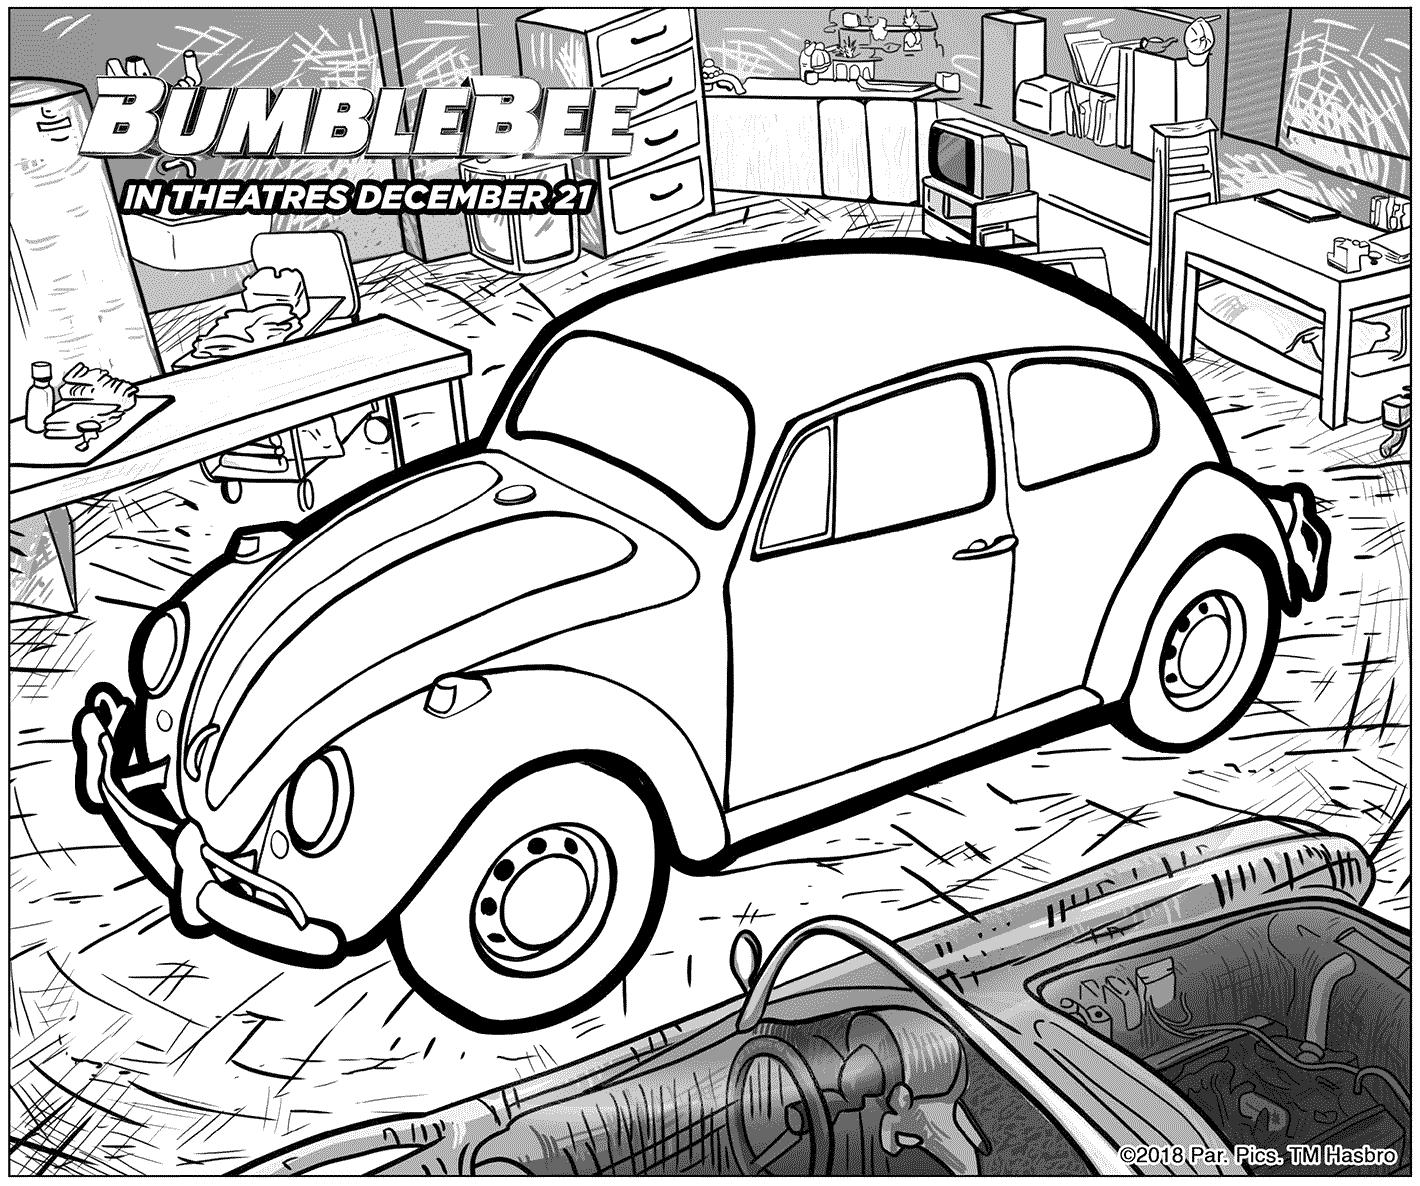 Printable Coloringansformer Pages Free Of Bumblebee – Slavyanka | 1186x1420